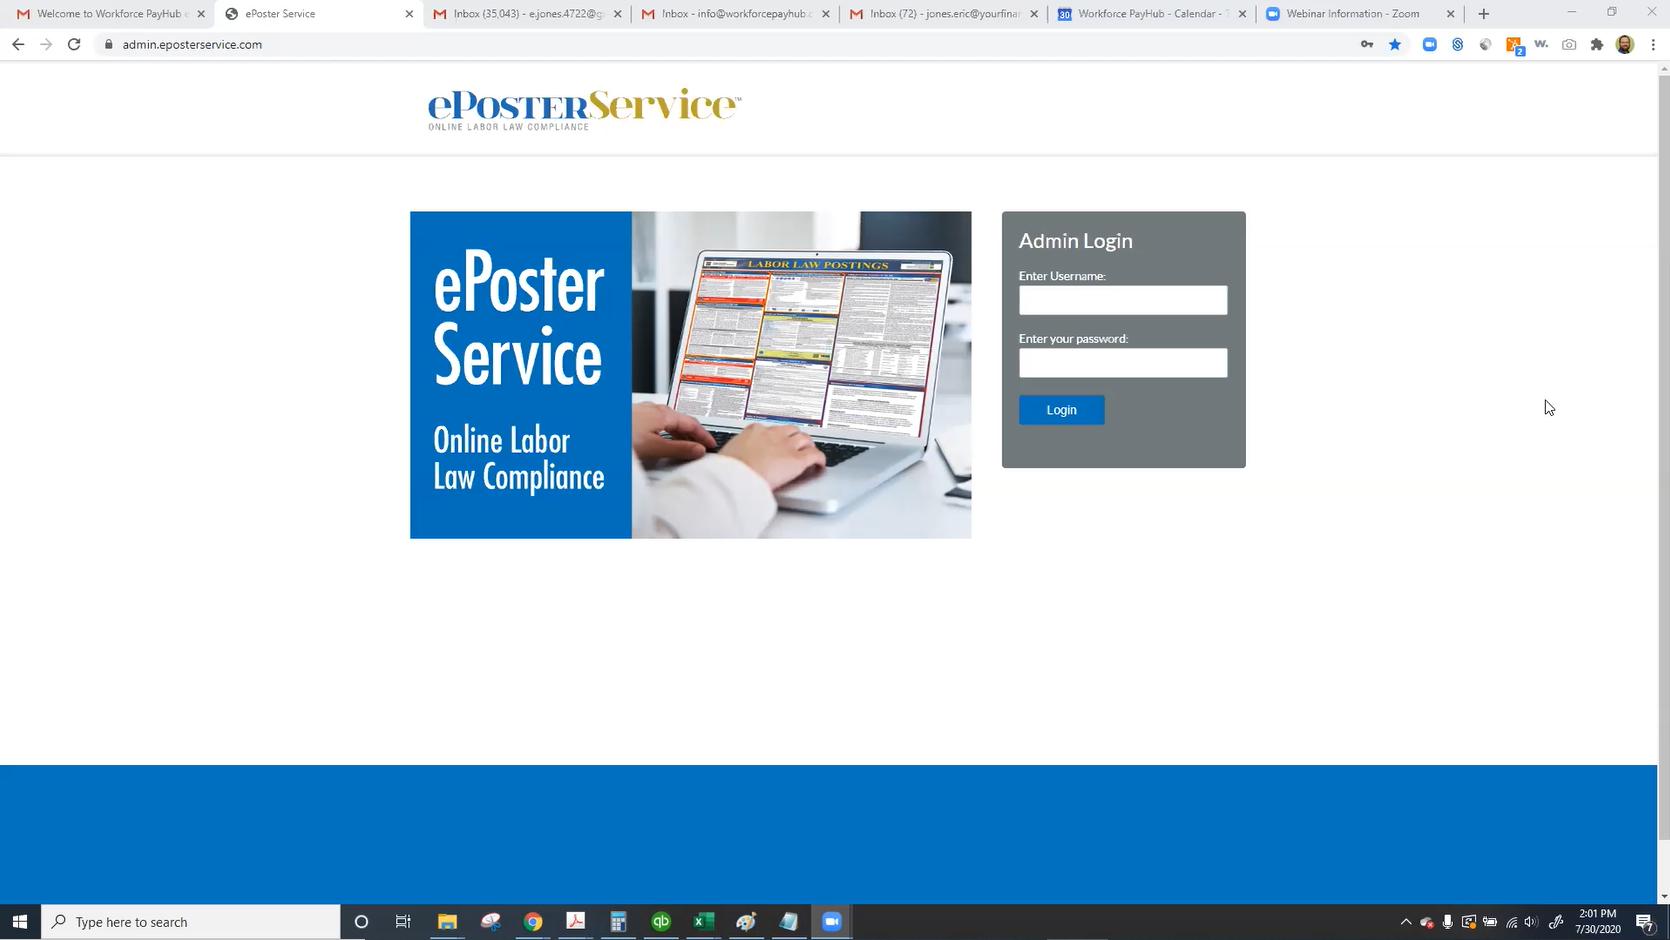 Workforce Webinar: ePoster Update